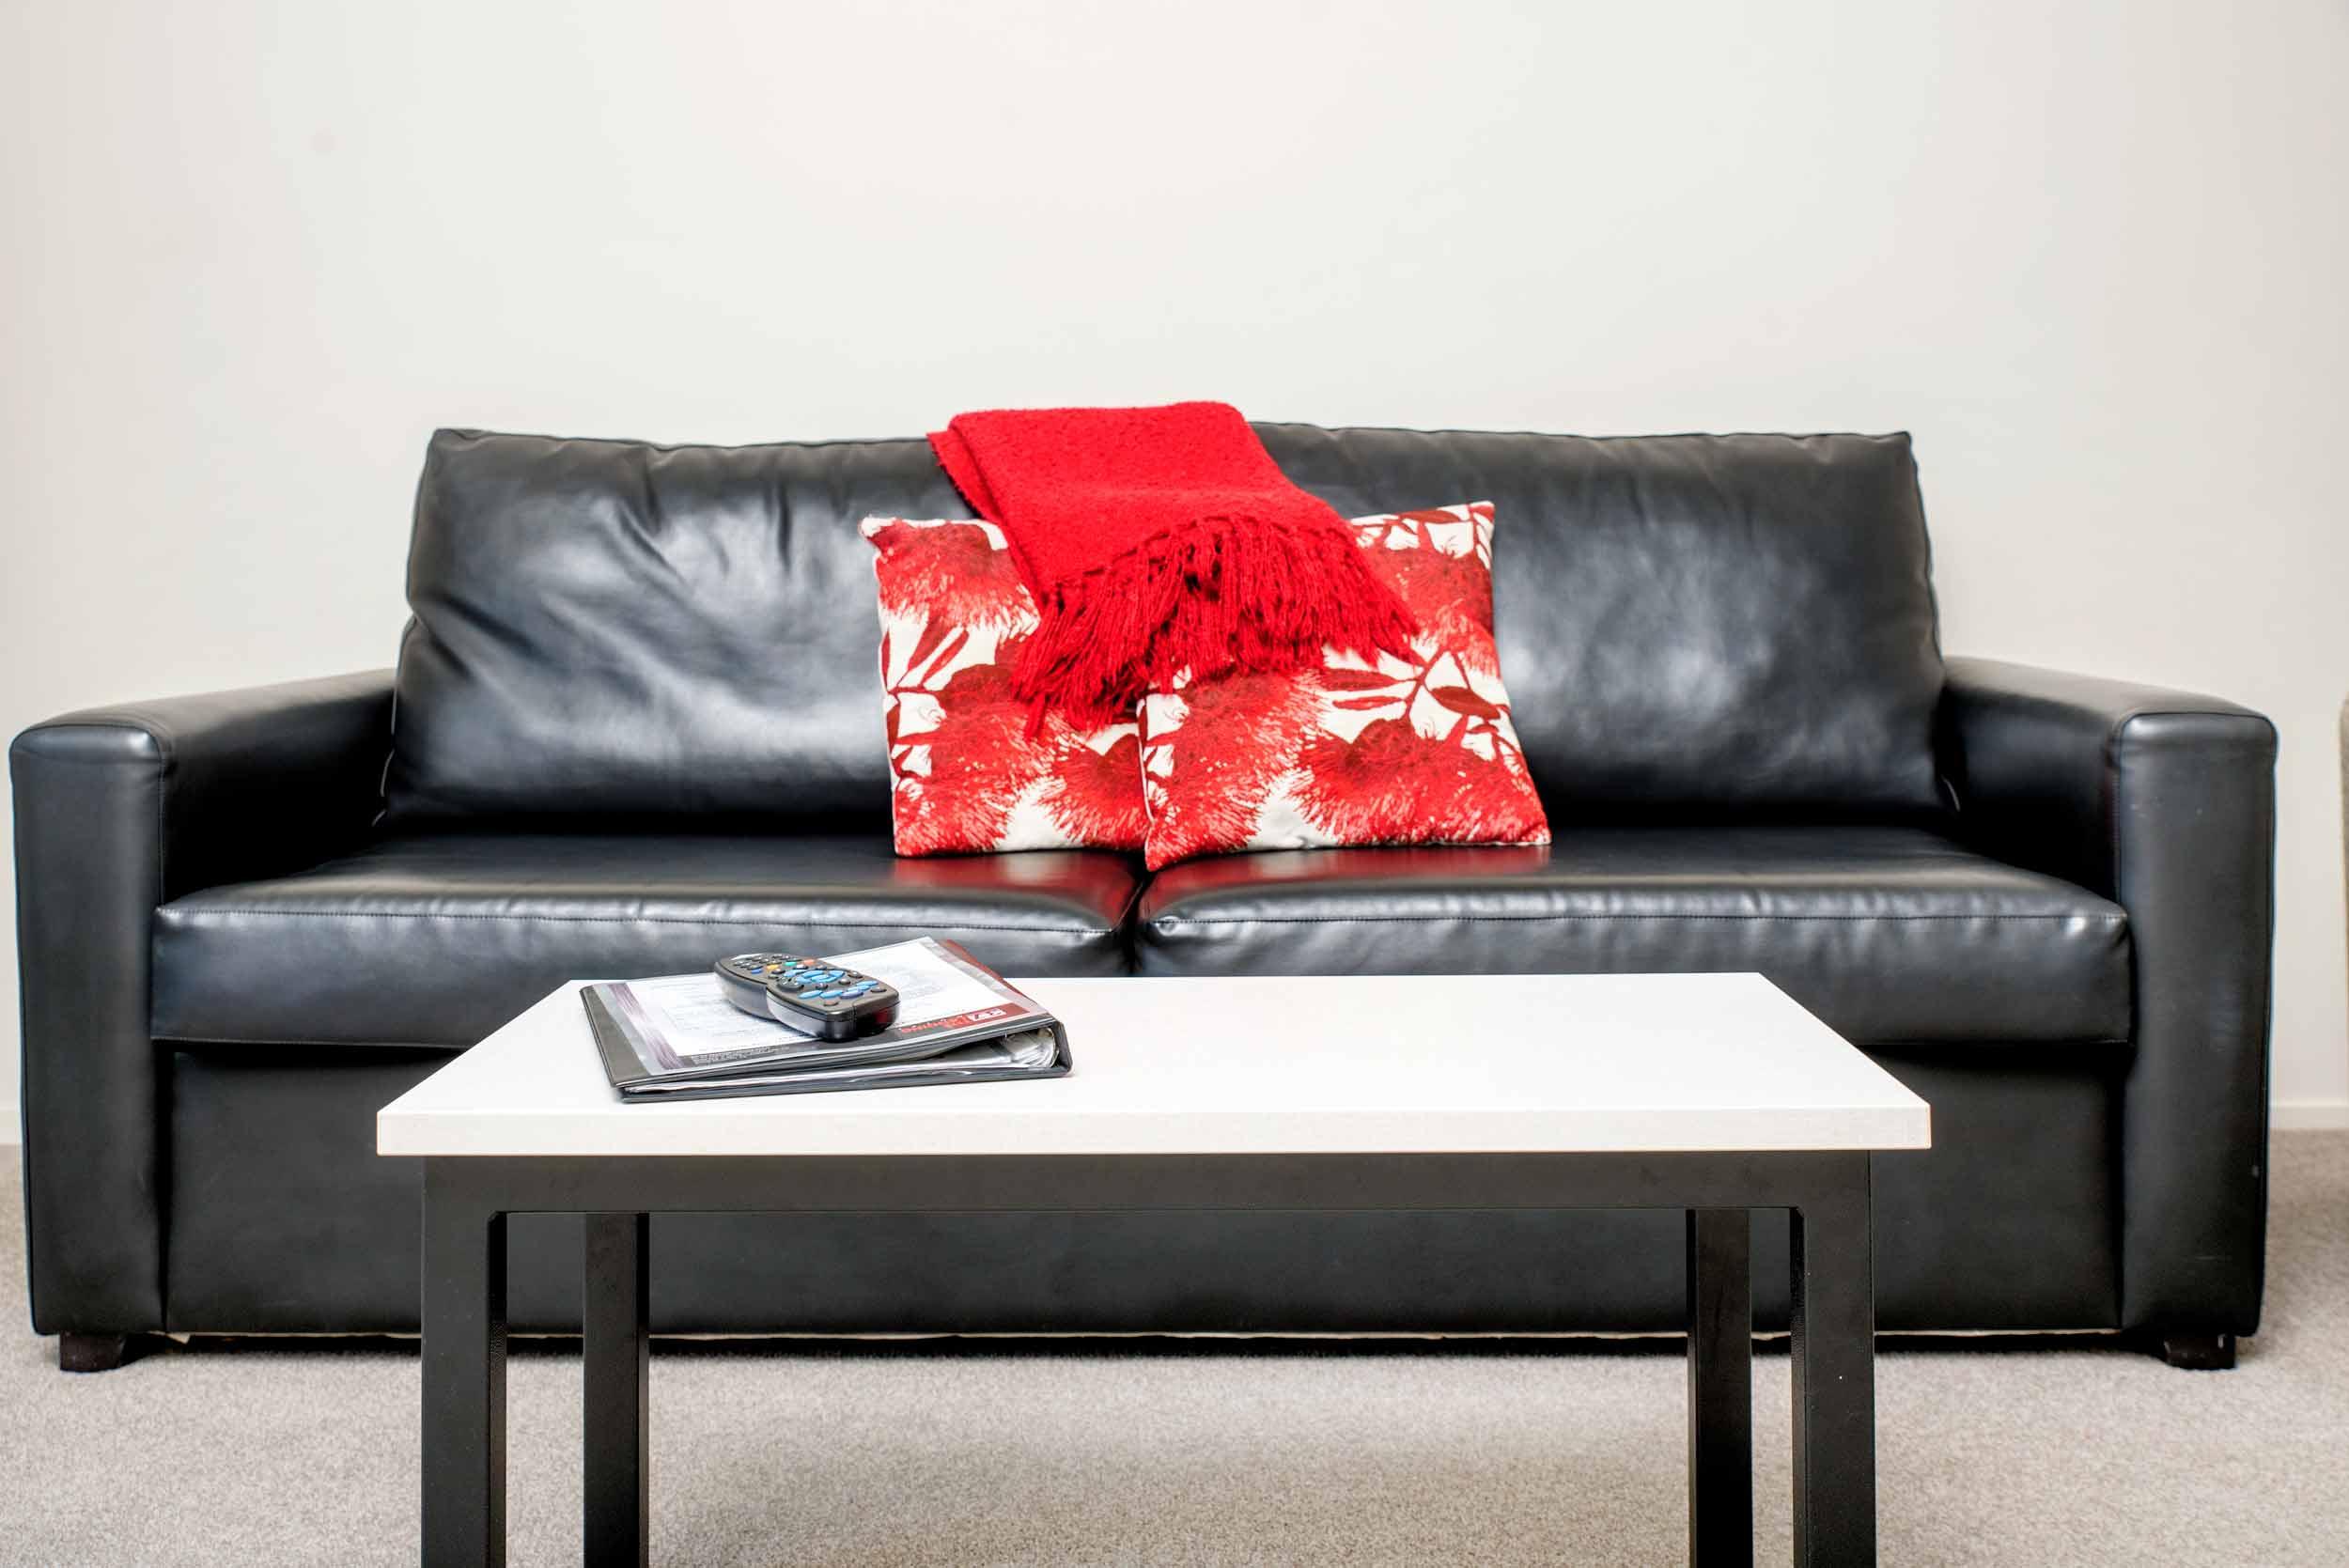 chair-book-direct.jpg